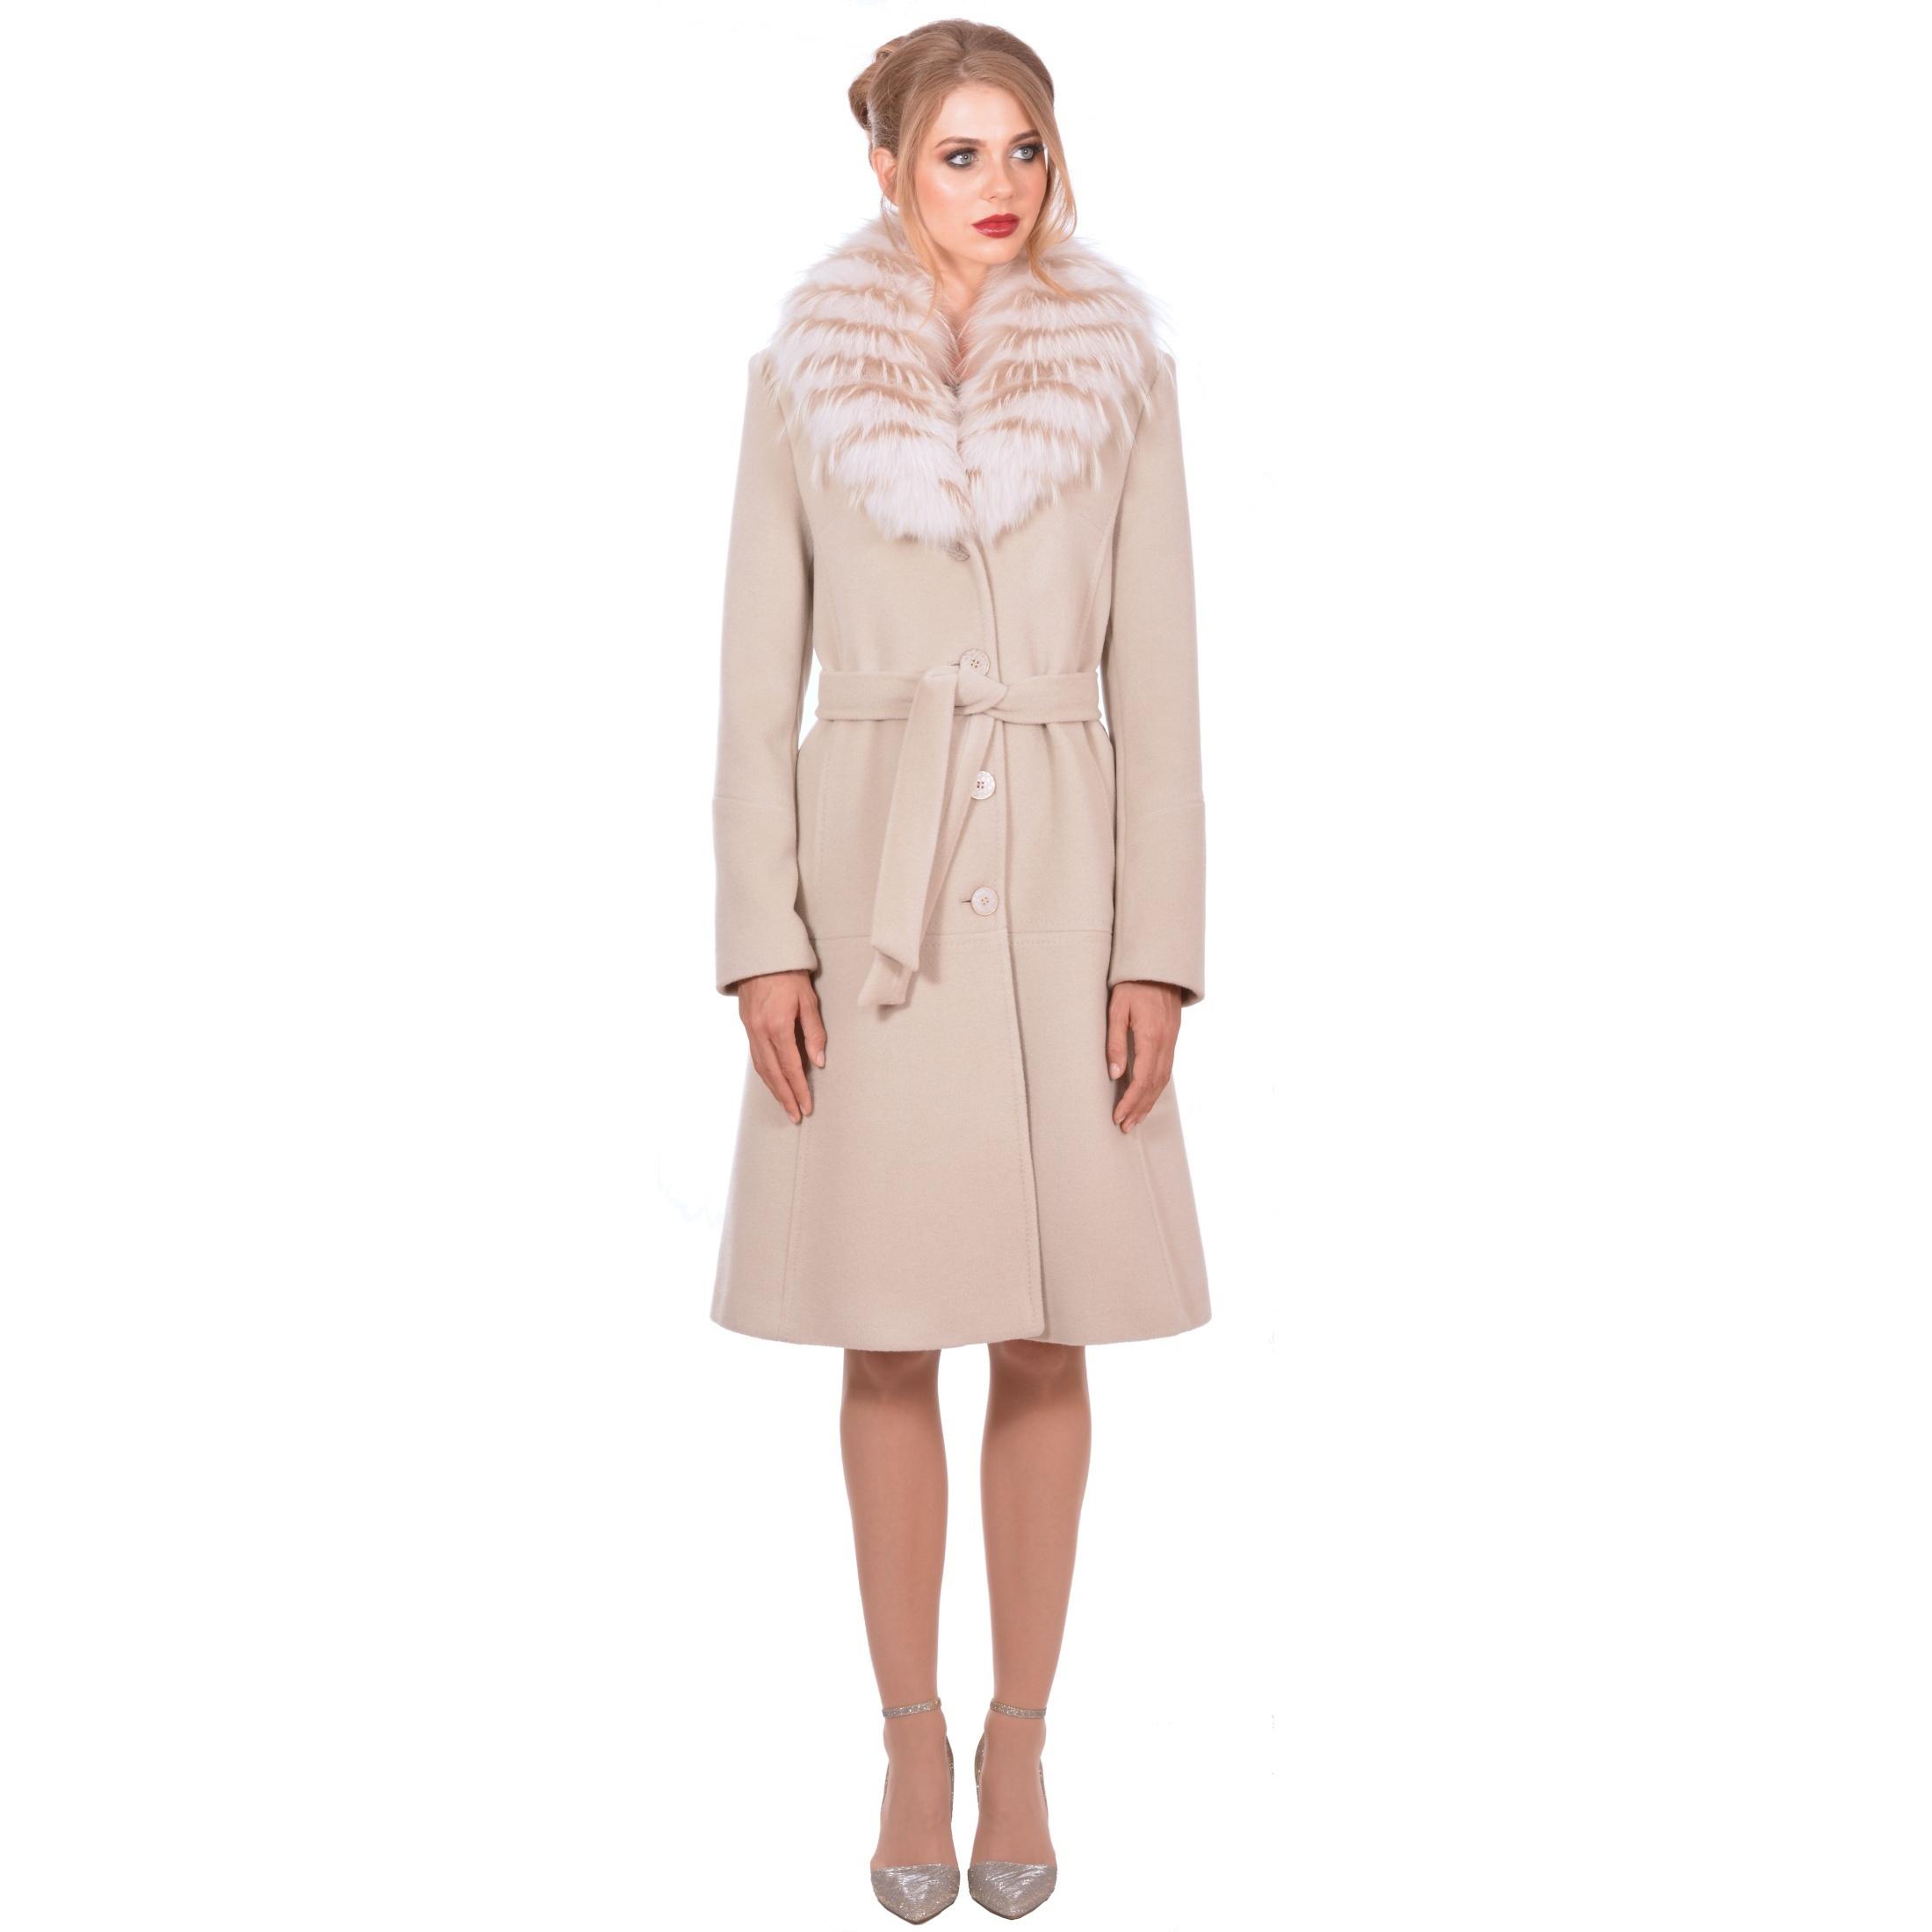 ženski kaput lady m, women's coat lady m